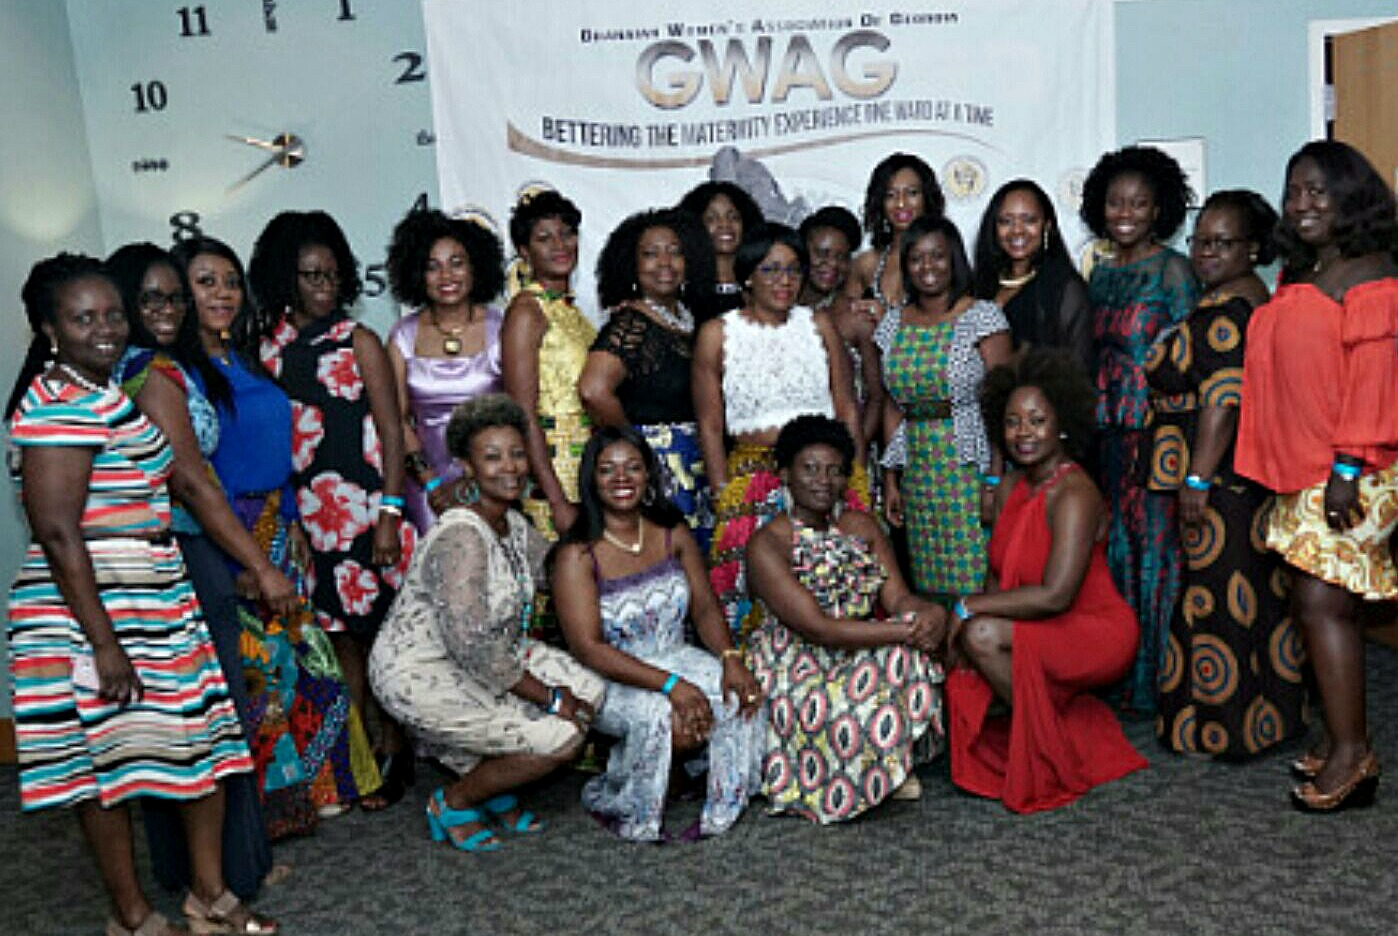 GWAG Group Photo